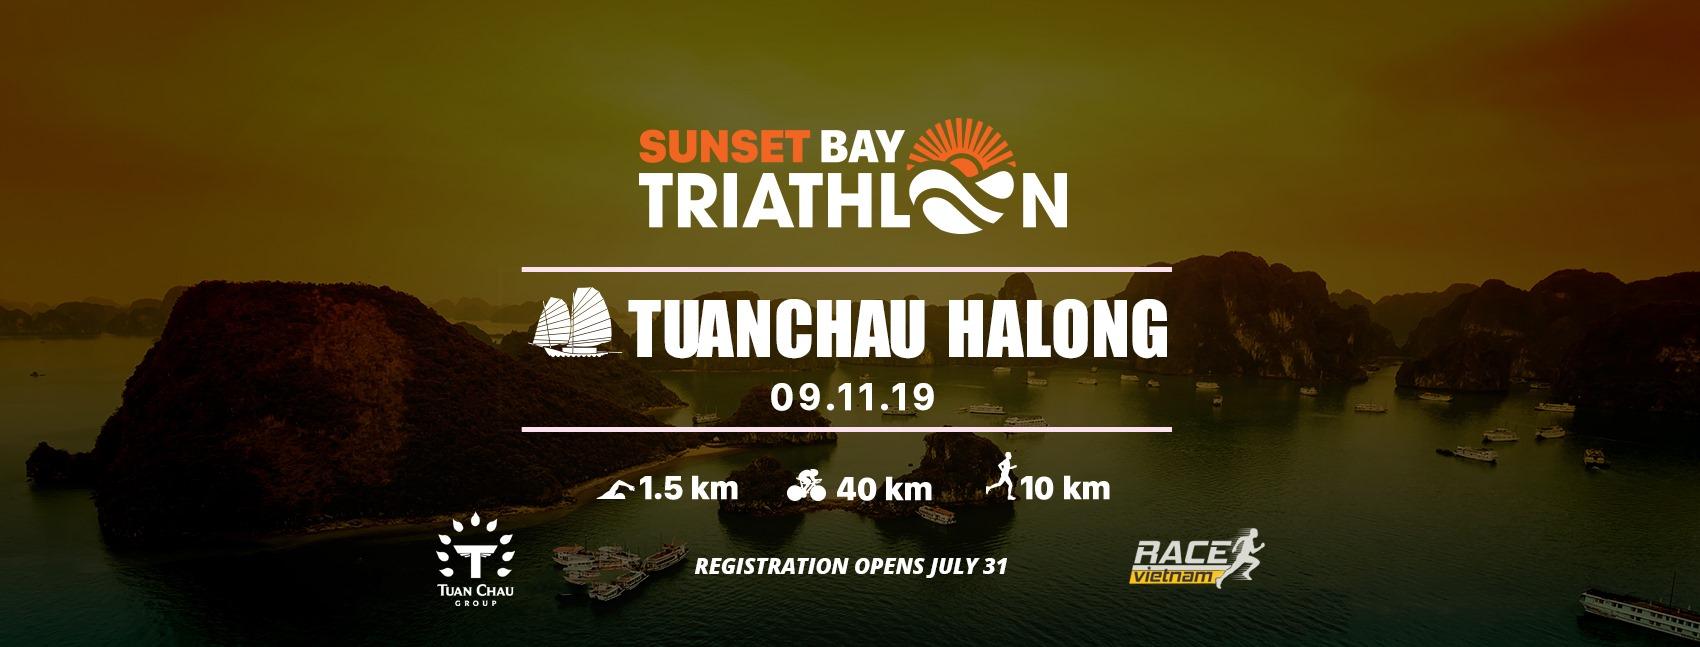 Sunset Bay Triathlon 2019